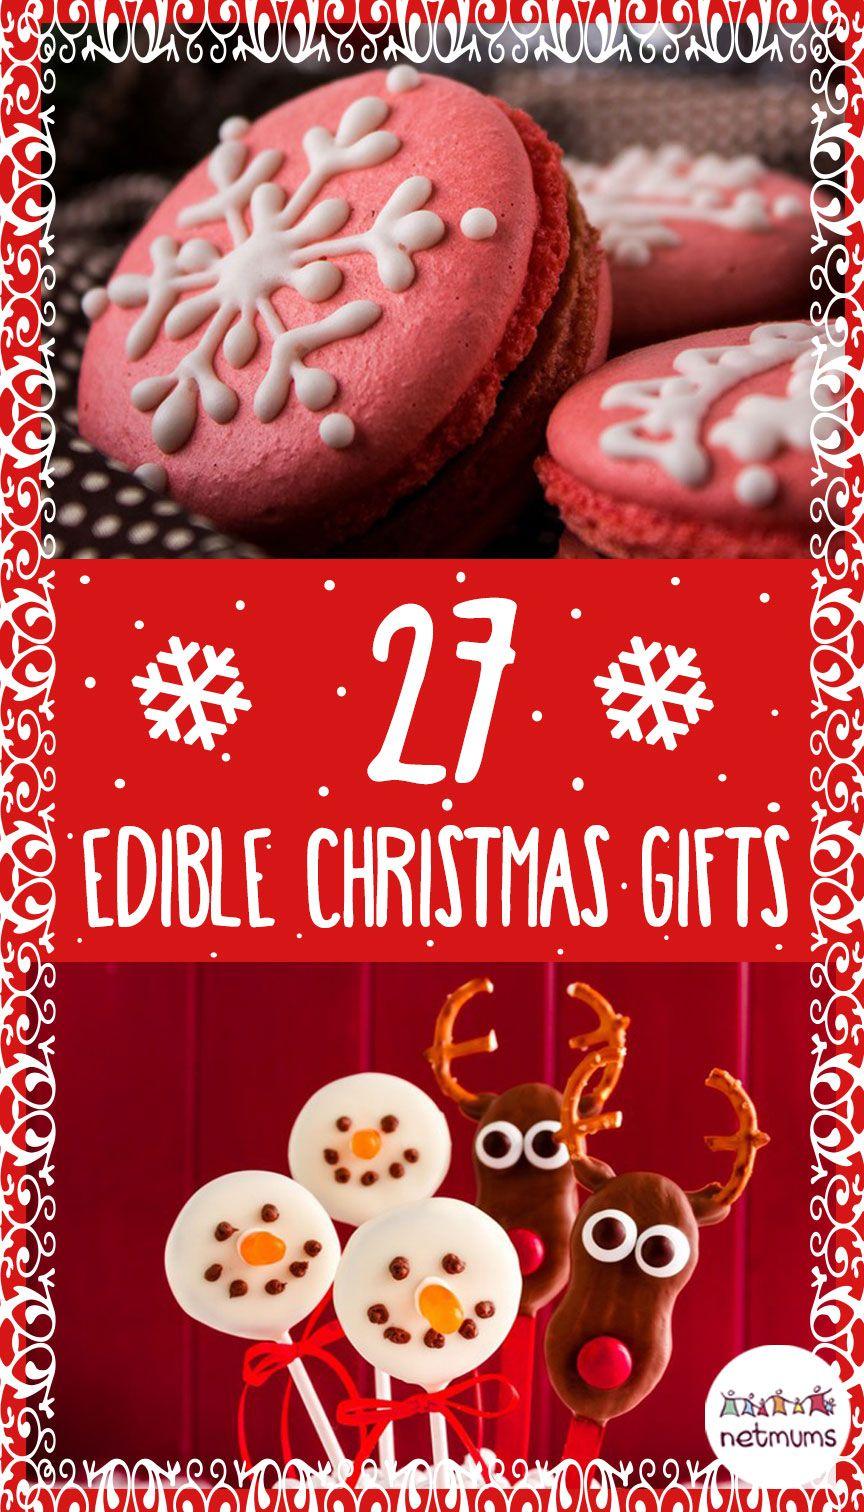 Homemade food gift ideas for Christmas 2017   Kids stockings ...